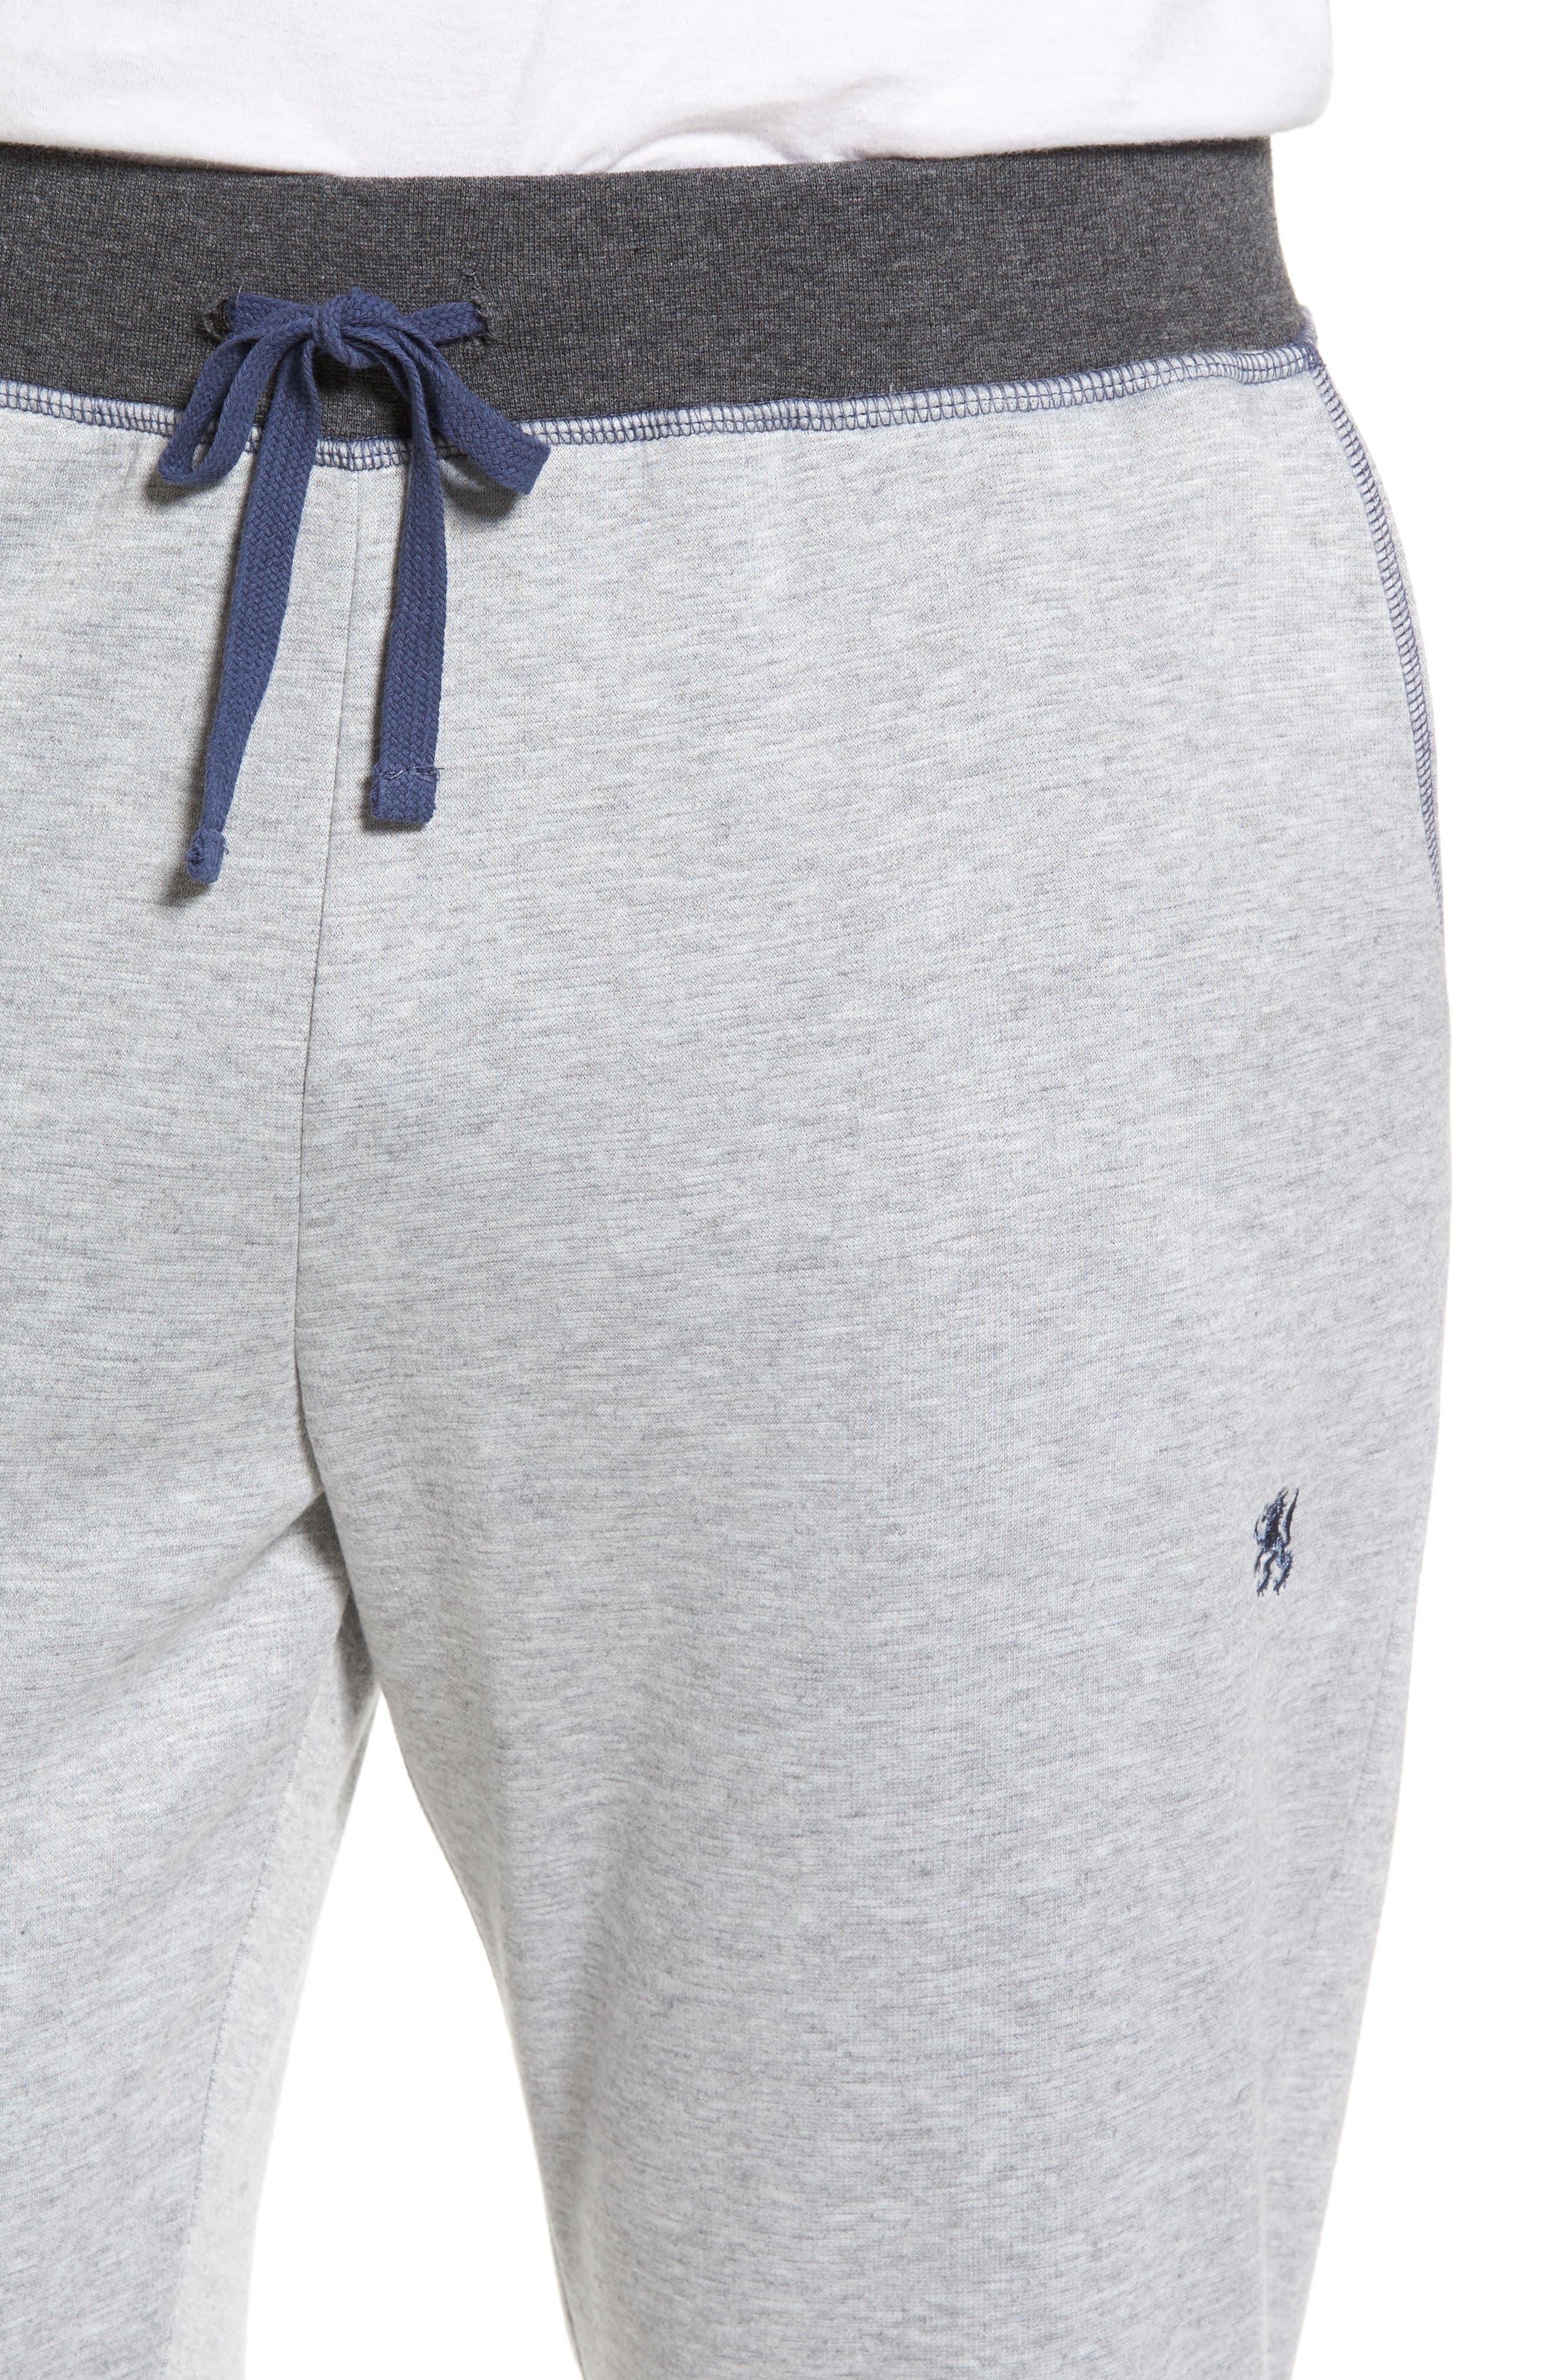 Double Take Knit Lounge Pants,                             Alternate thumbnail 4, color,                             025